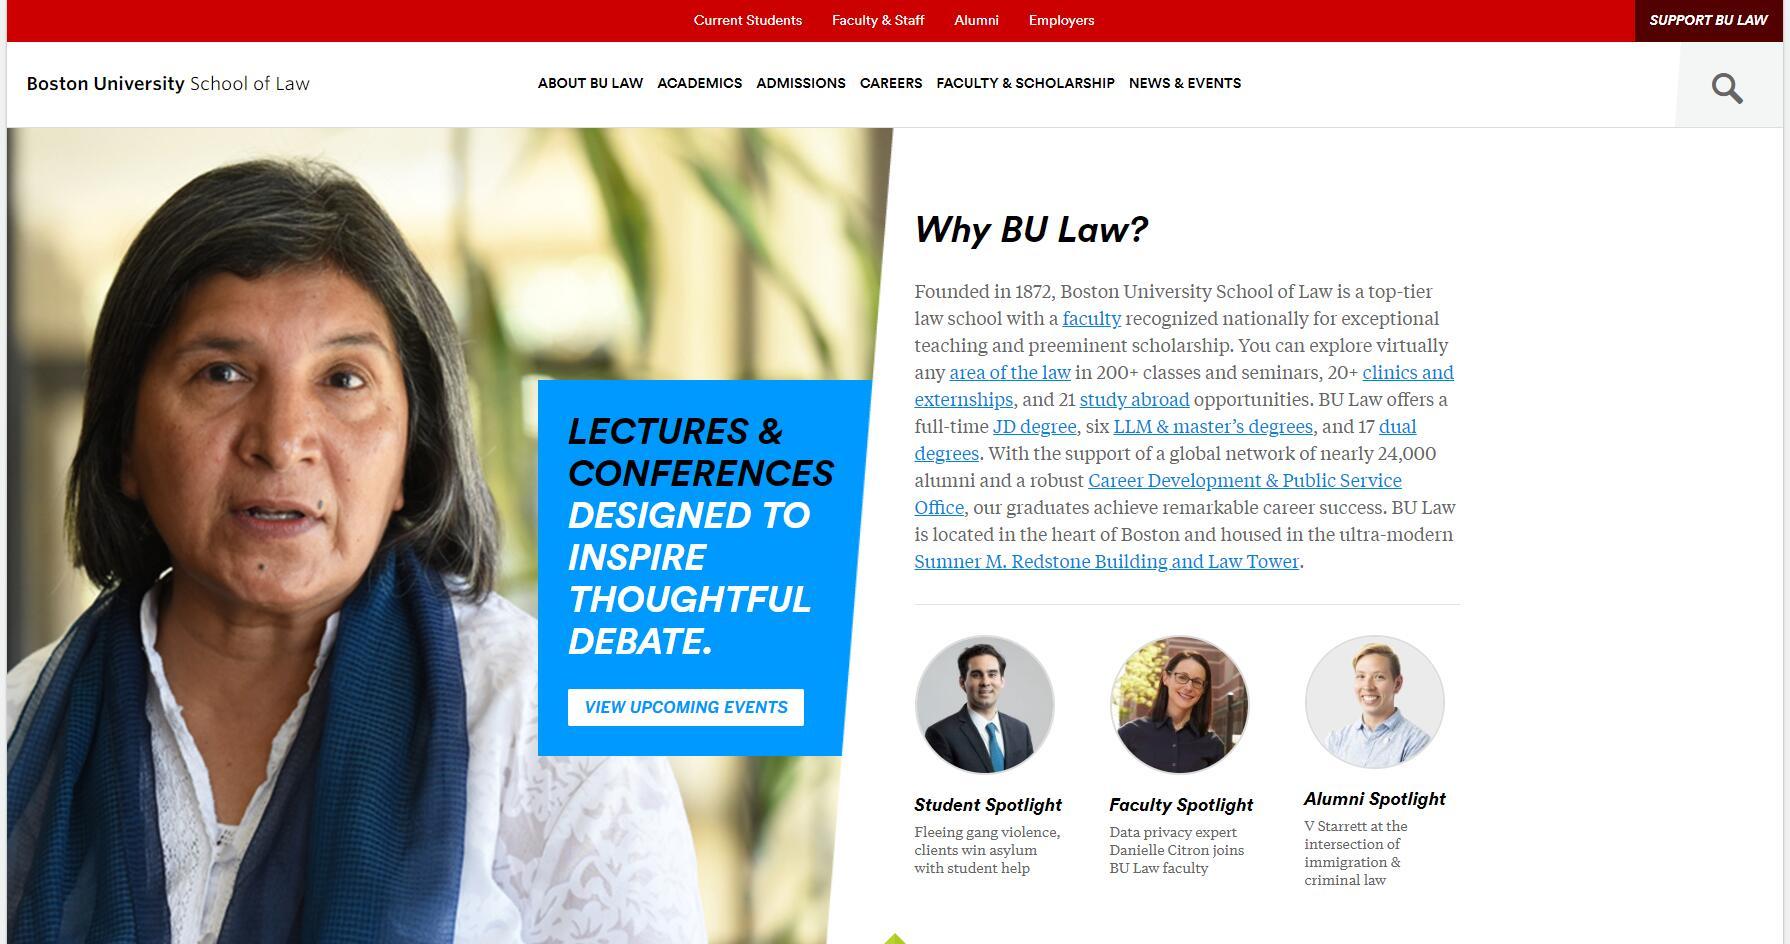 The School of Law at Boston University